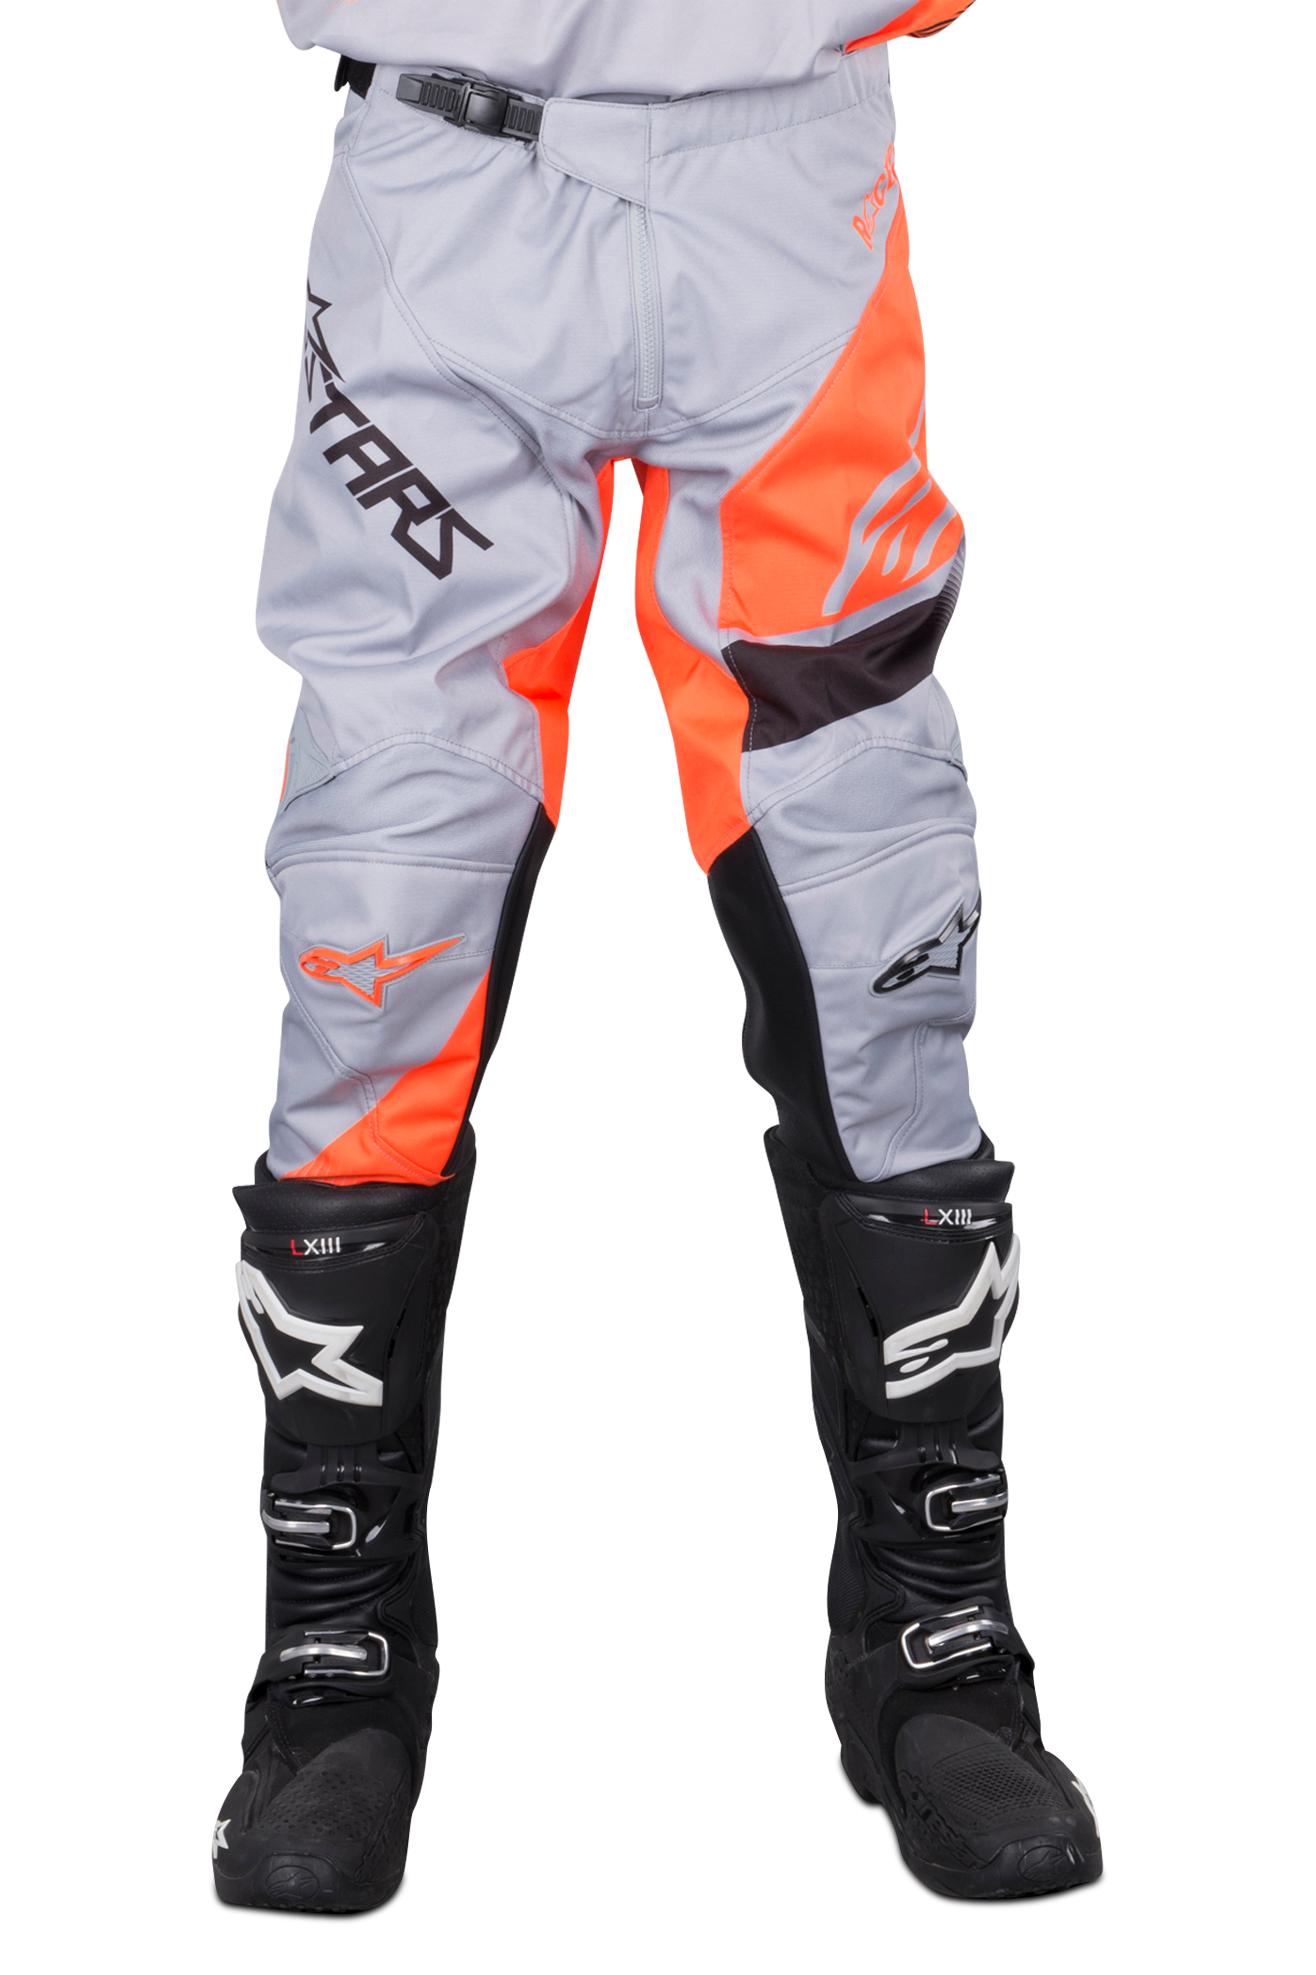 Alpinestars Pantaloni Cross  Racer Supermatic Grigio-Nero-Arancio Fluo